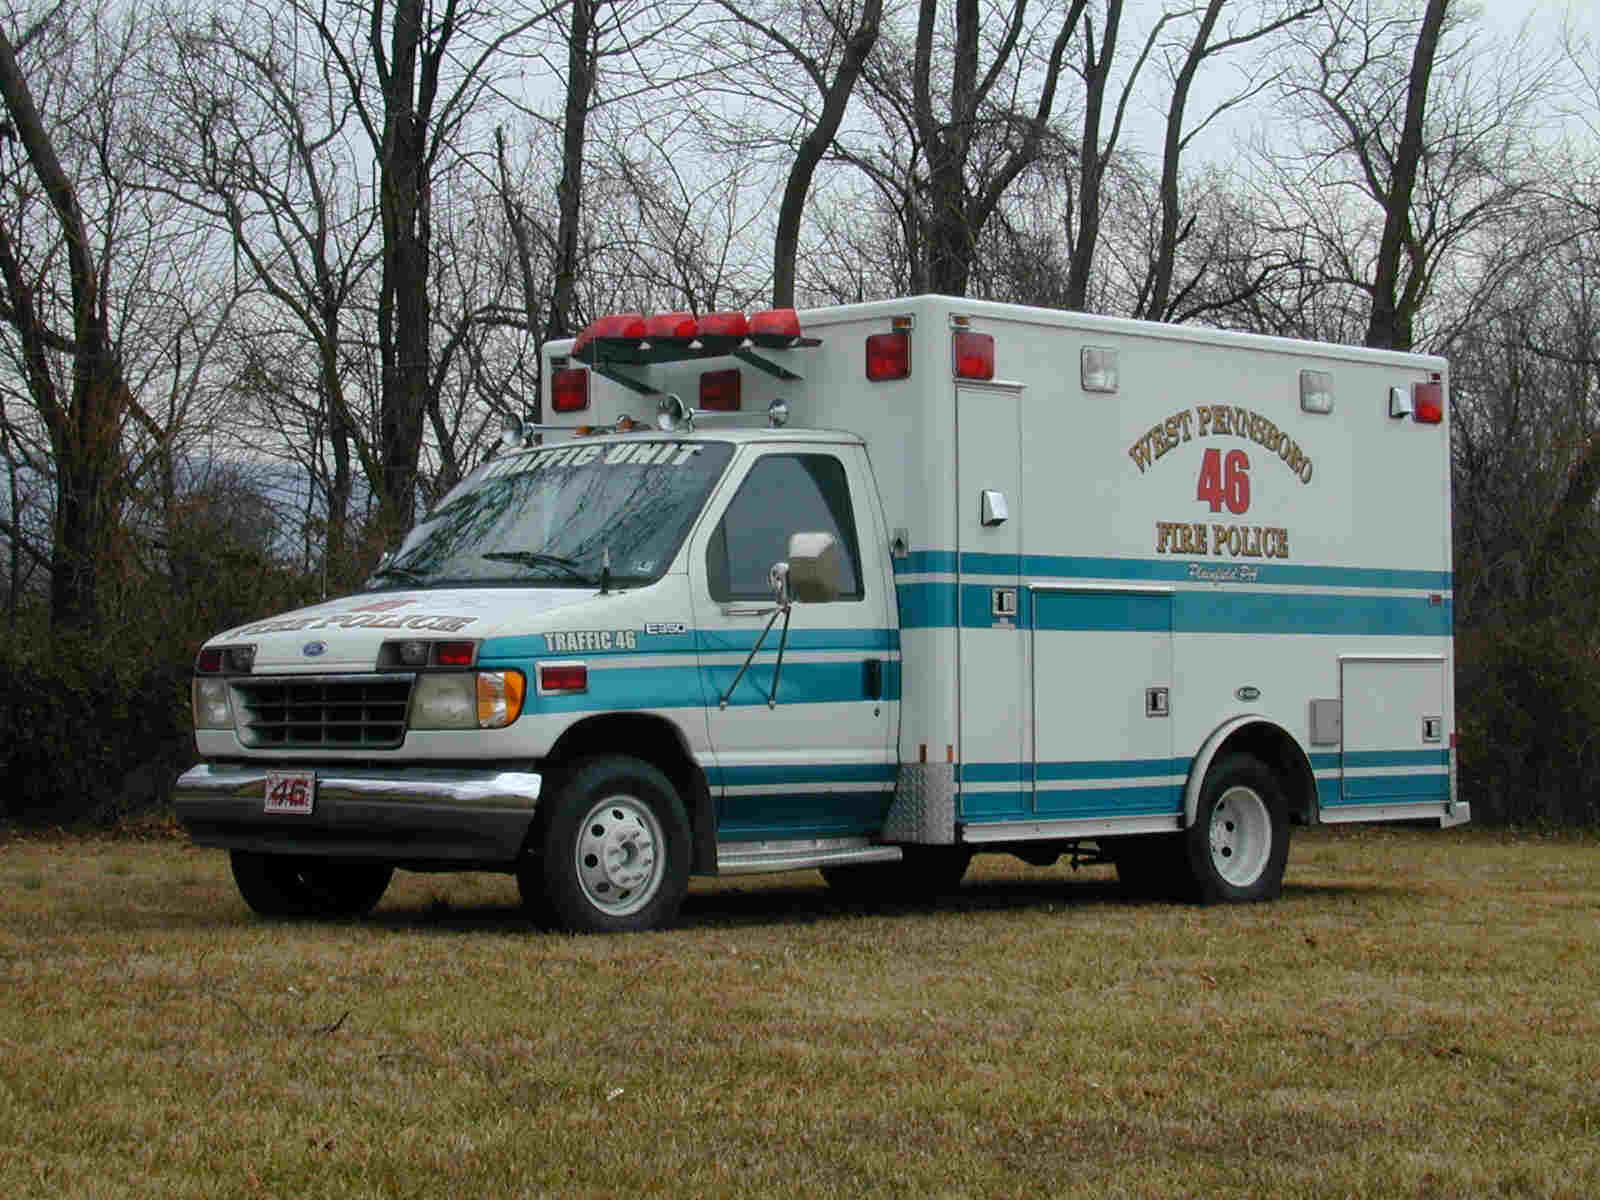 West Pennsboro Township, Cumberland County Traffic 46